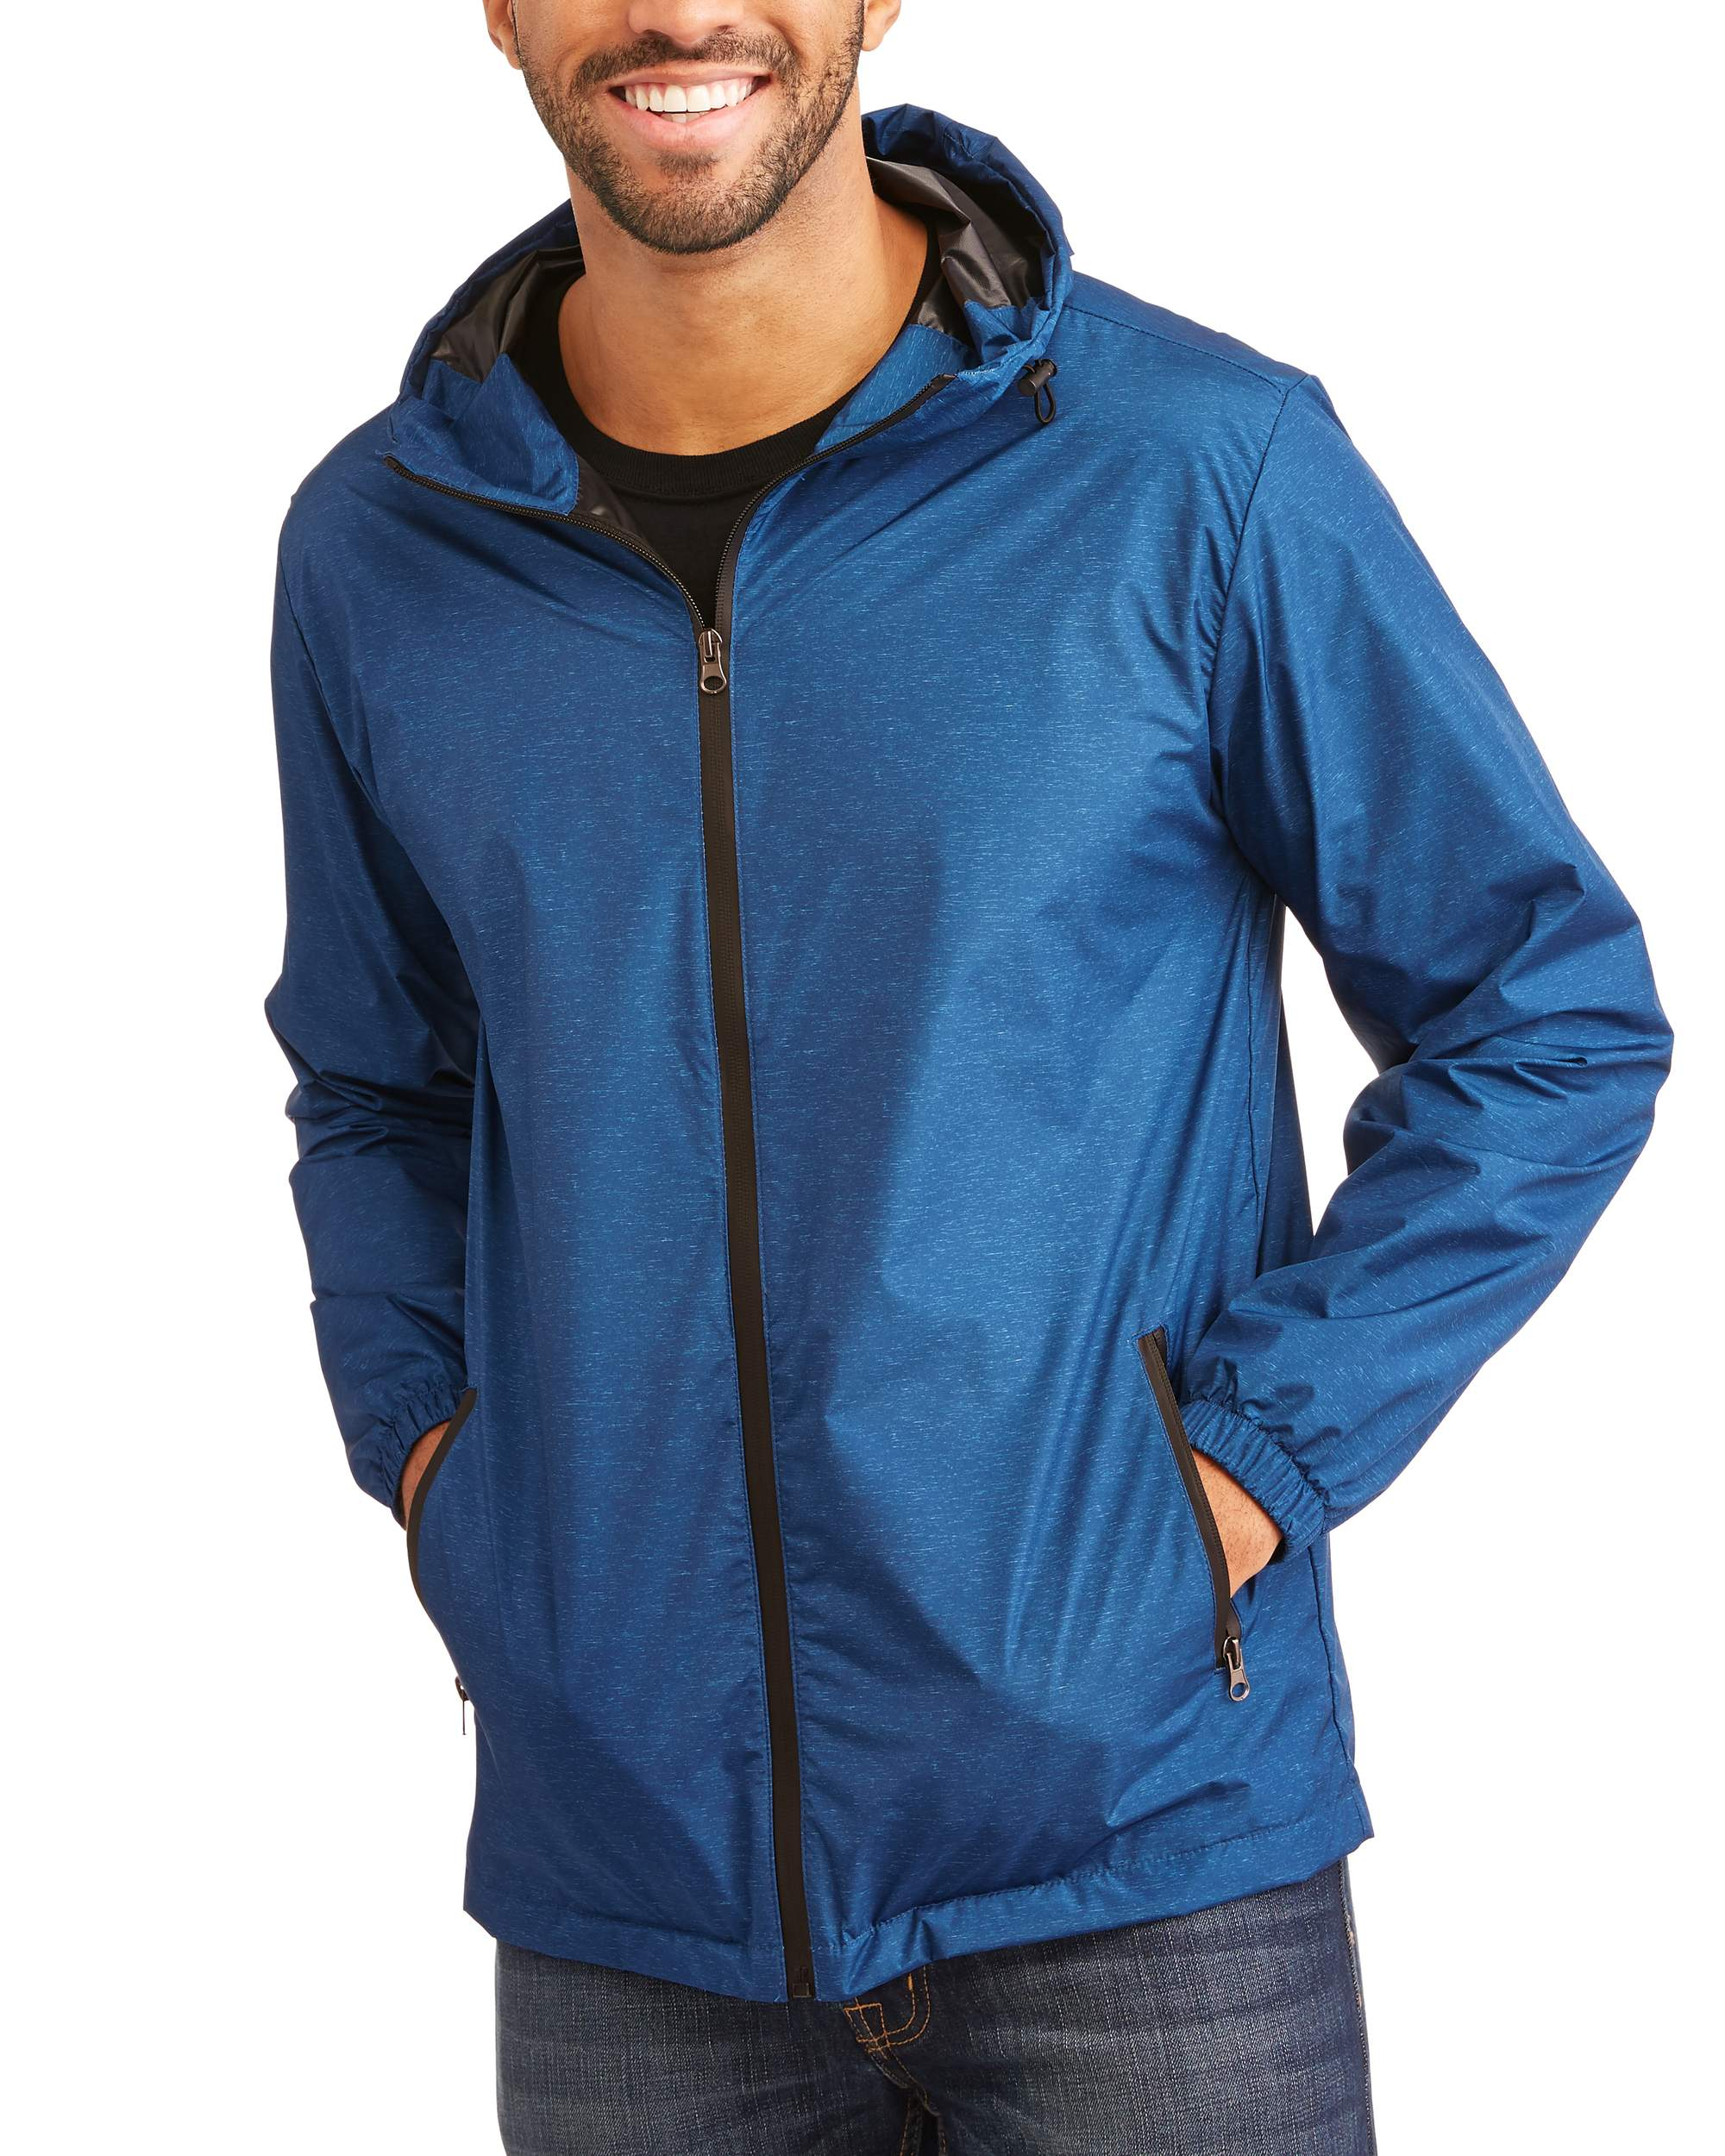 Men's Lightweight Nylon Performance Jacket by